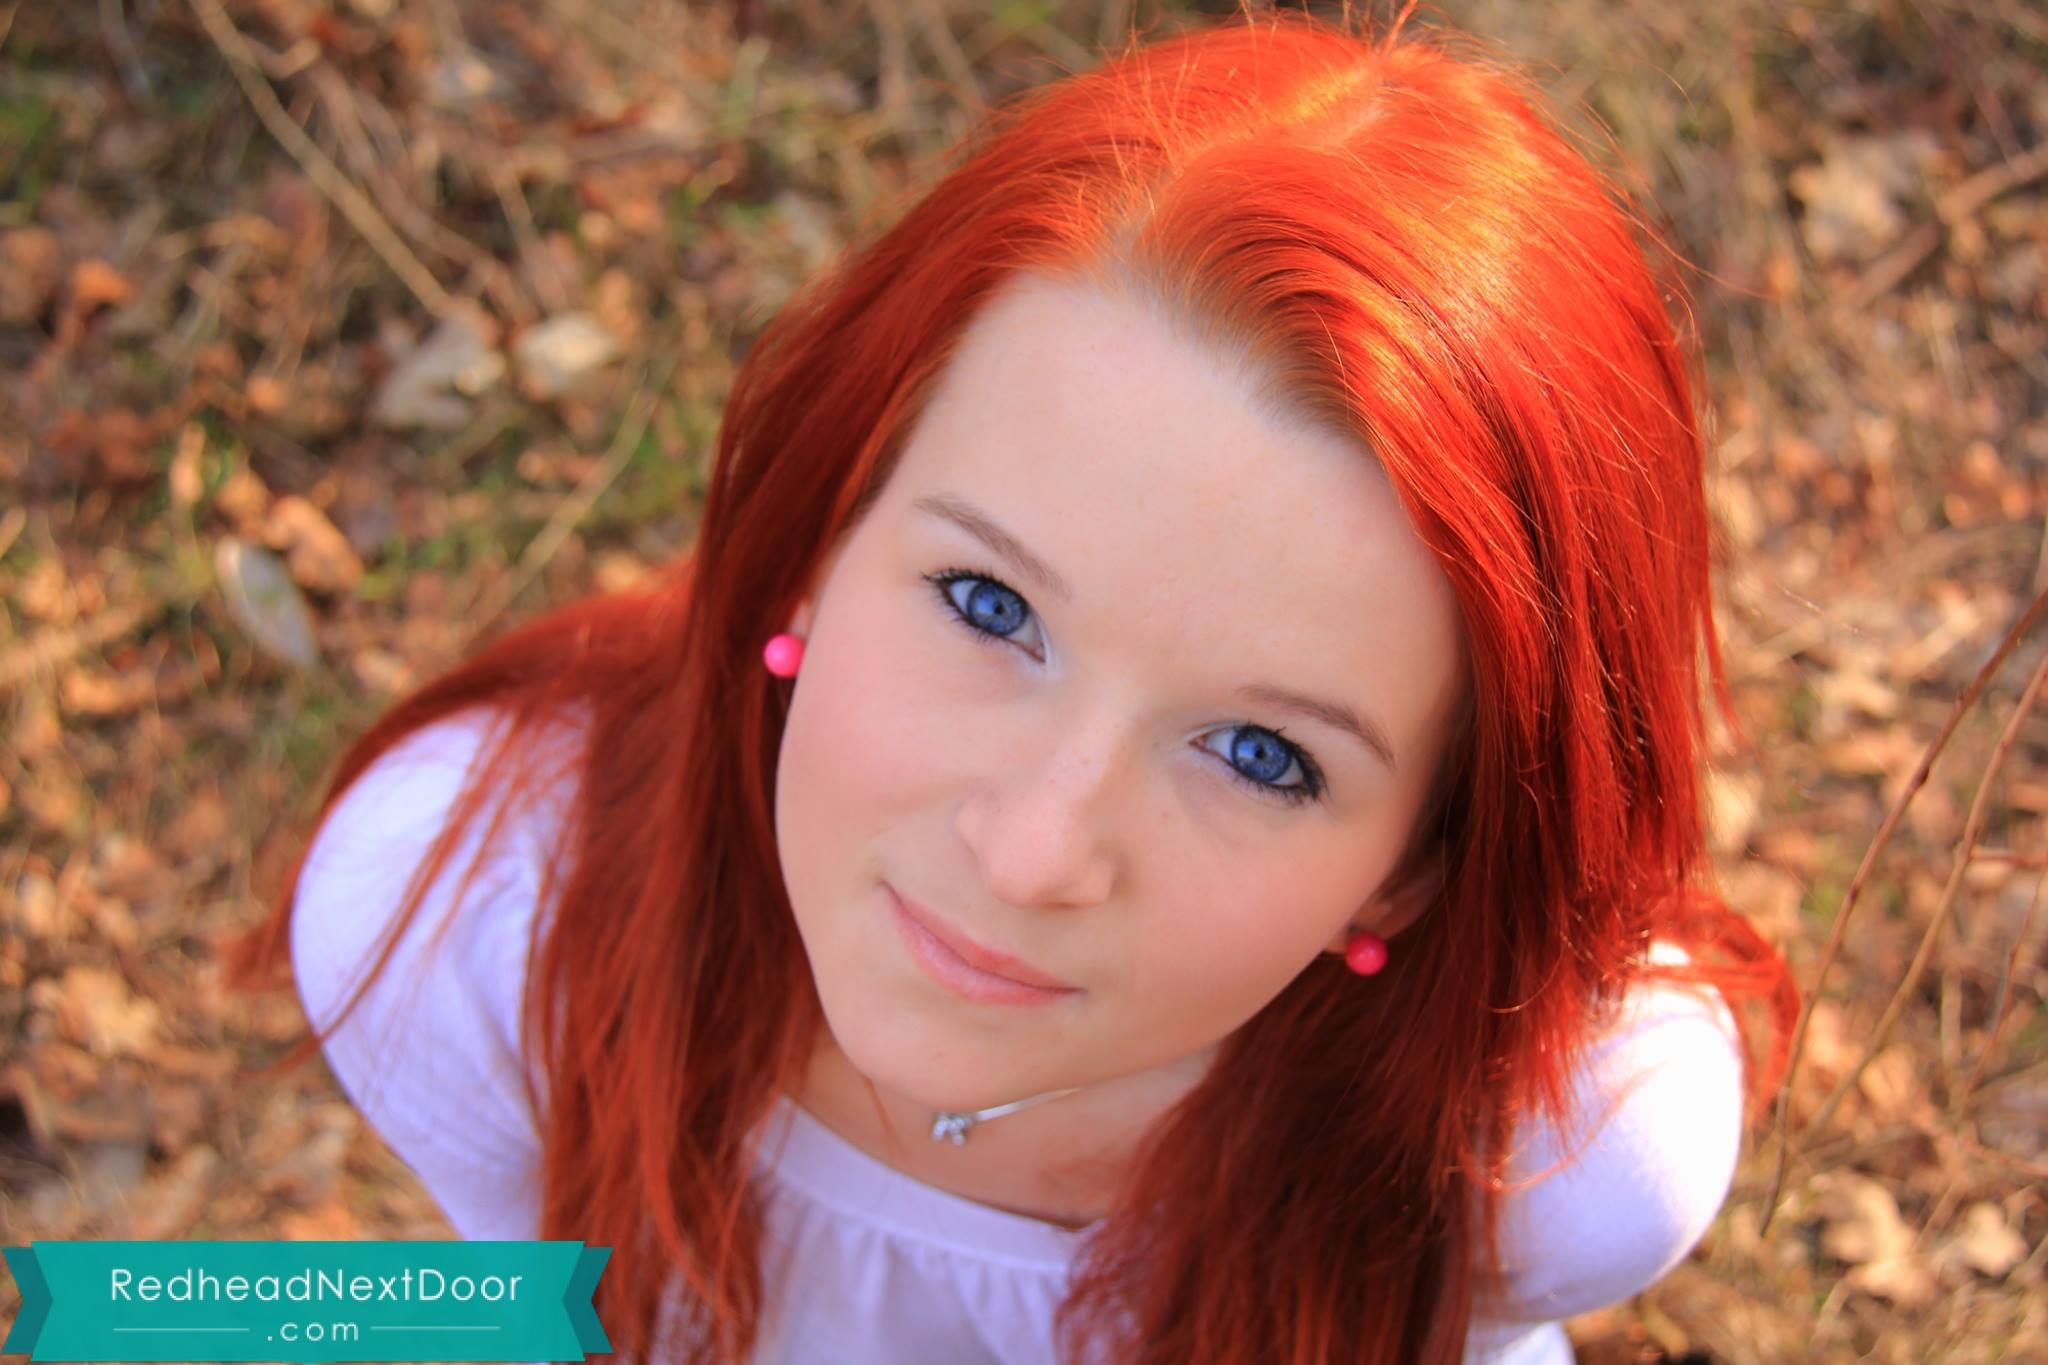 Hiding those beautiful eyes! - Redhead Next Door Photo Gallery